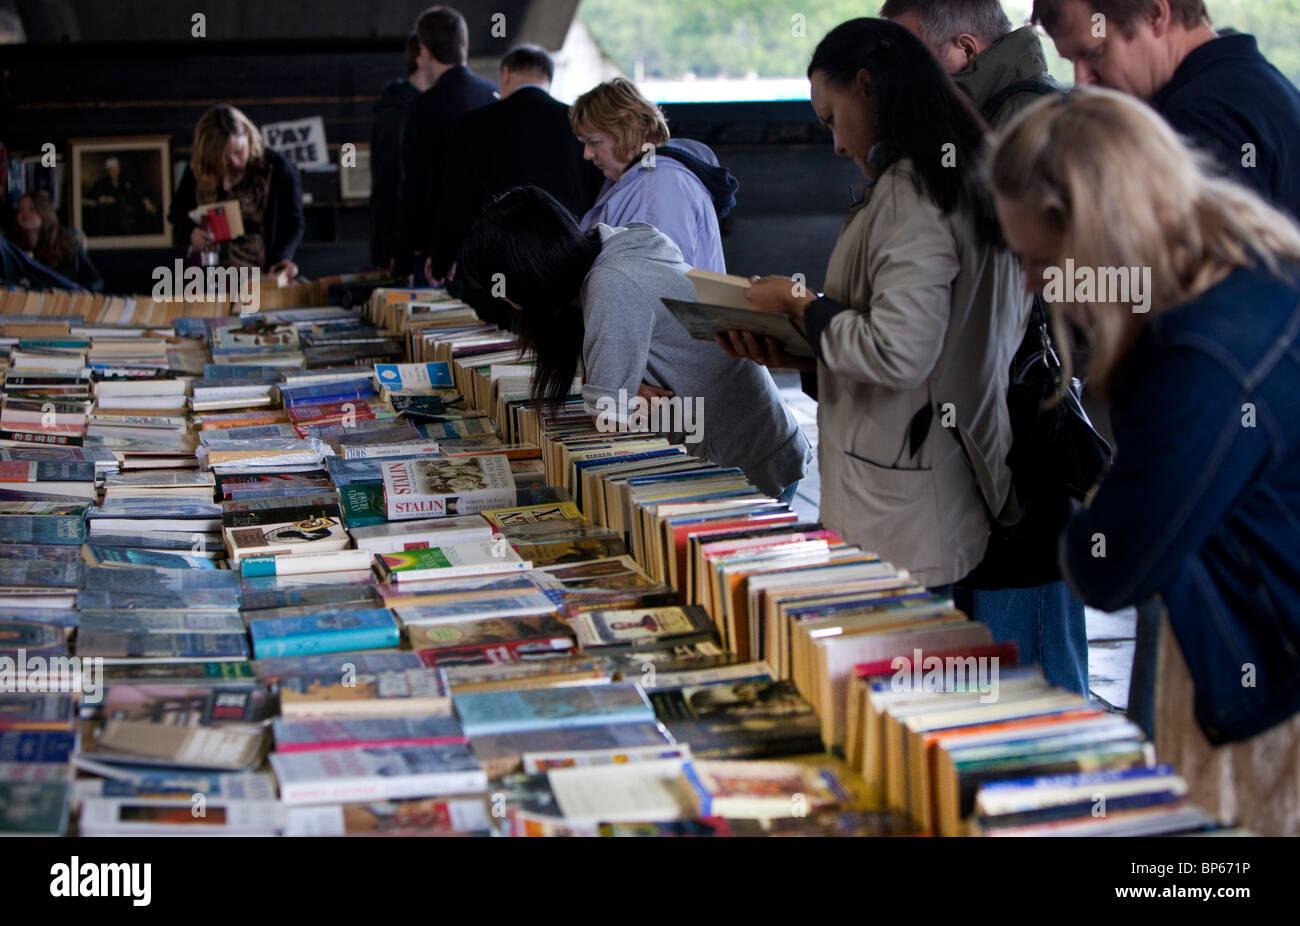 Secondhand paperback books for sale, Waterloo Bridge, London, England, UK - Stock Image